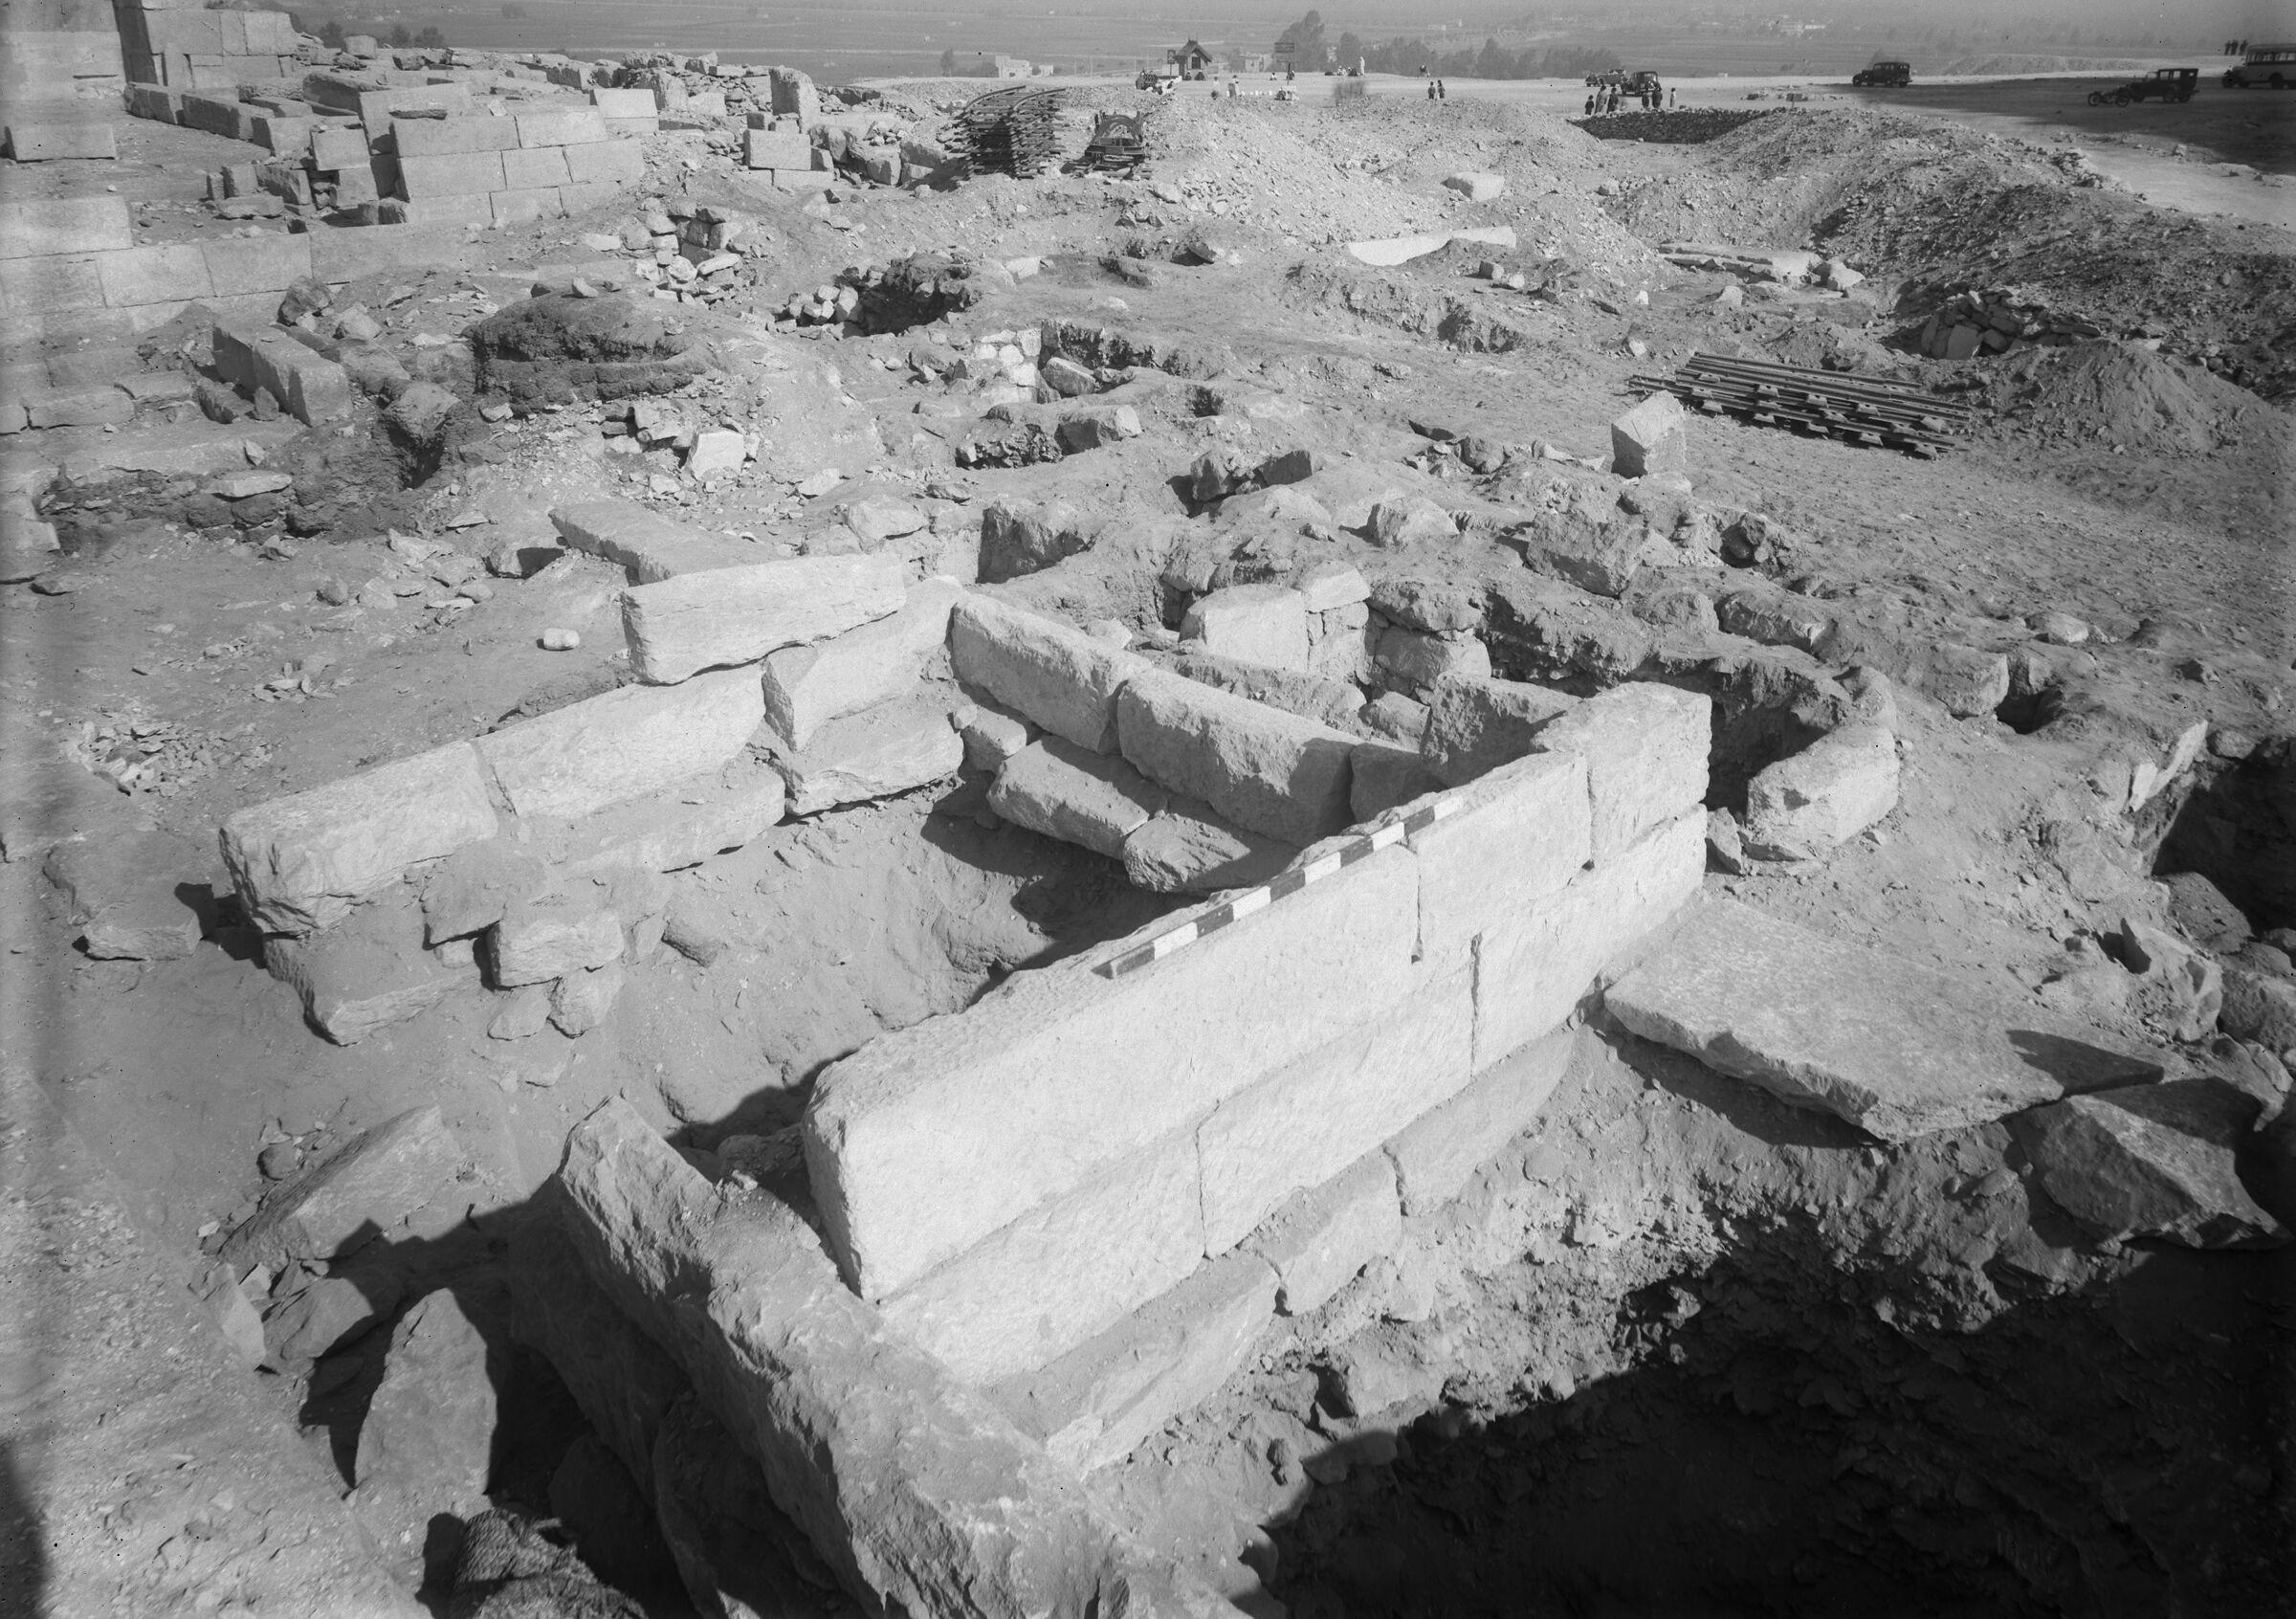 Western Cemetery: Site: Giza; View: G 5552, G 5553, G 5561, G 5551, G 5563, G 5564